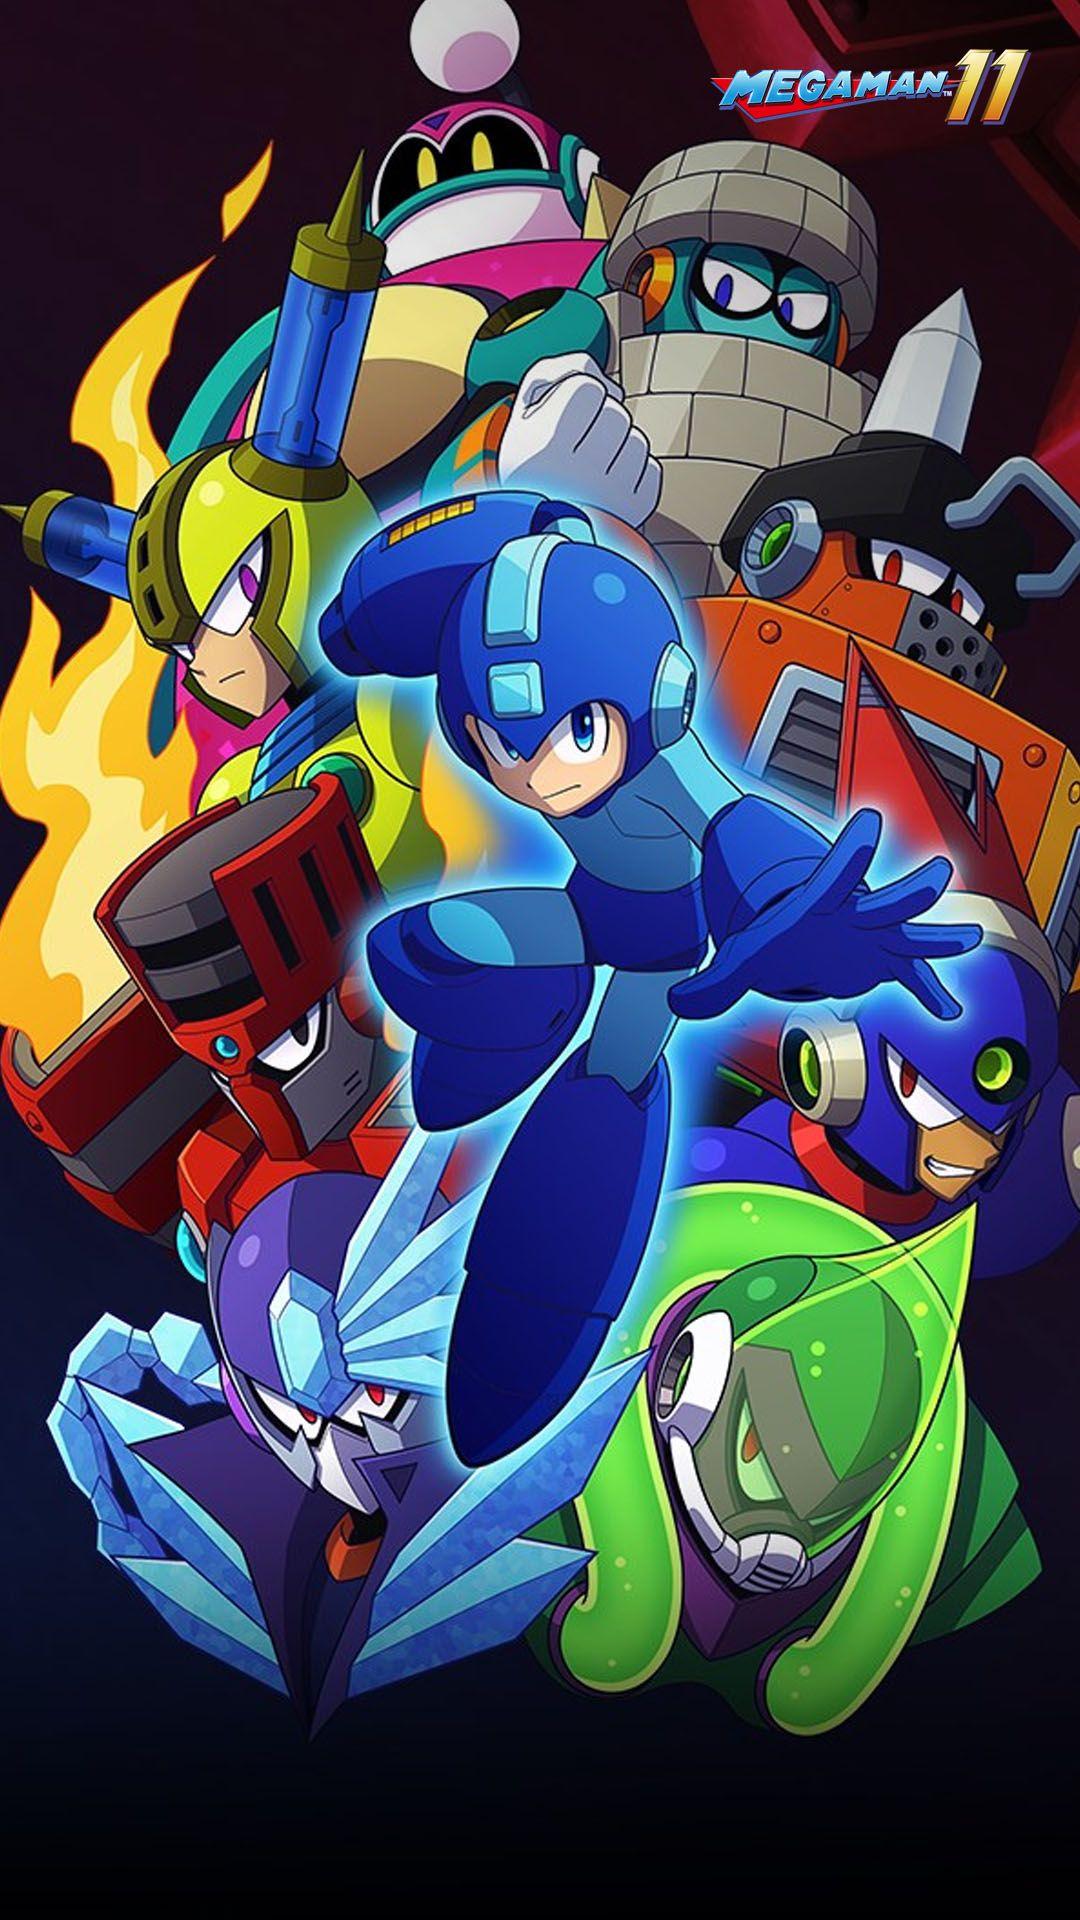 Wallpaper Gamer Mega Man 11 Mega Man Art Mega Man Game Art